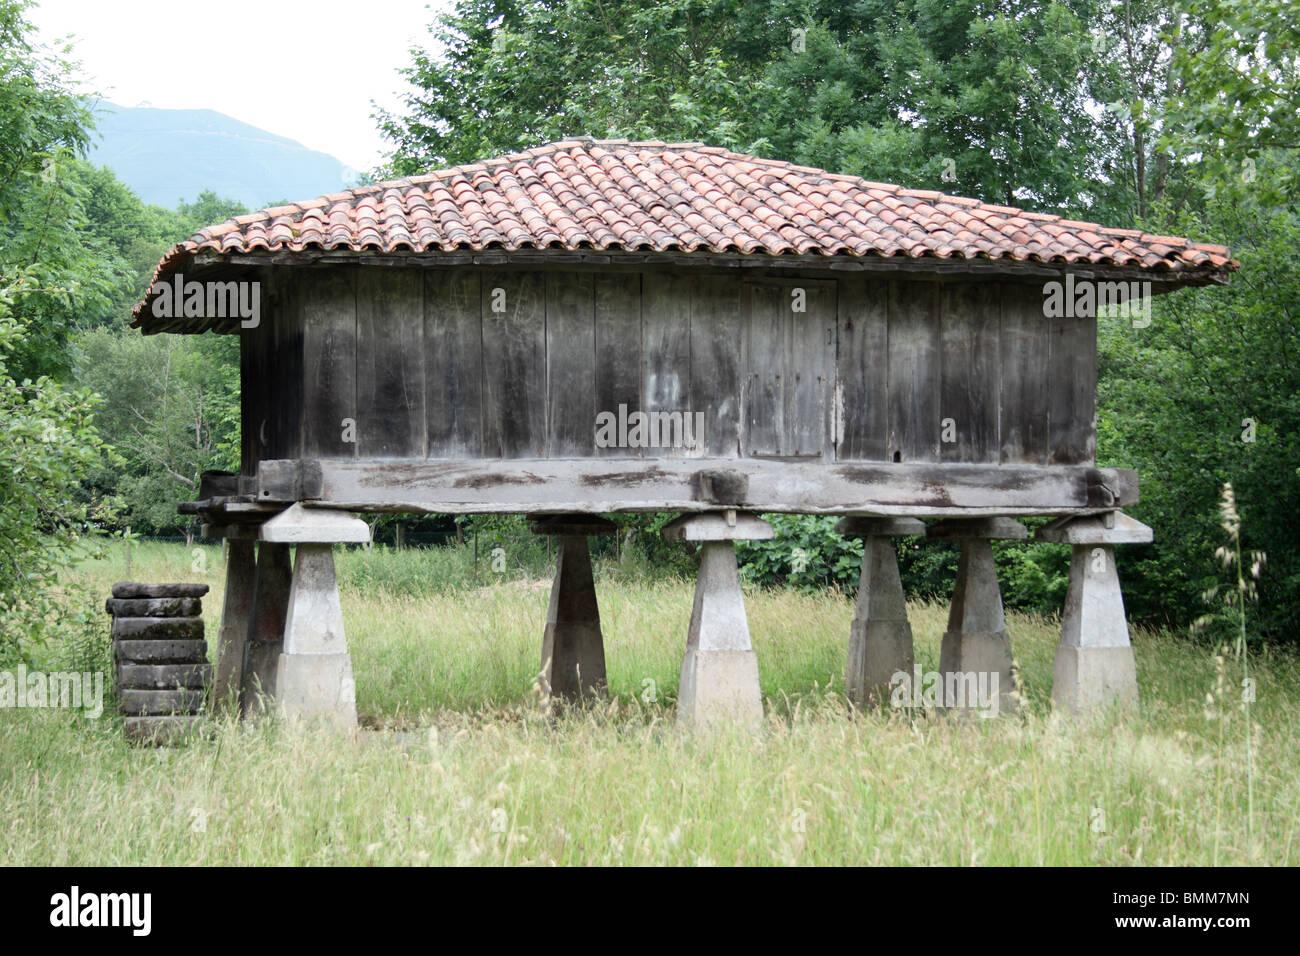 Traditional wooden grain store on stone stilts, near Cangas de Onis, Picos de Europa, Asturias, Spain - Stock Image